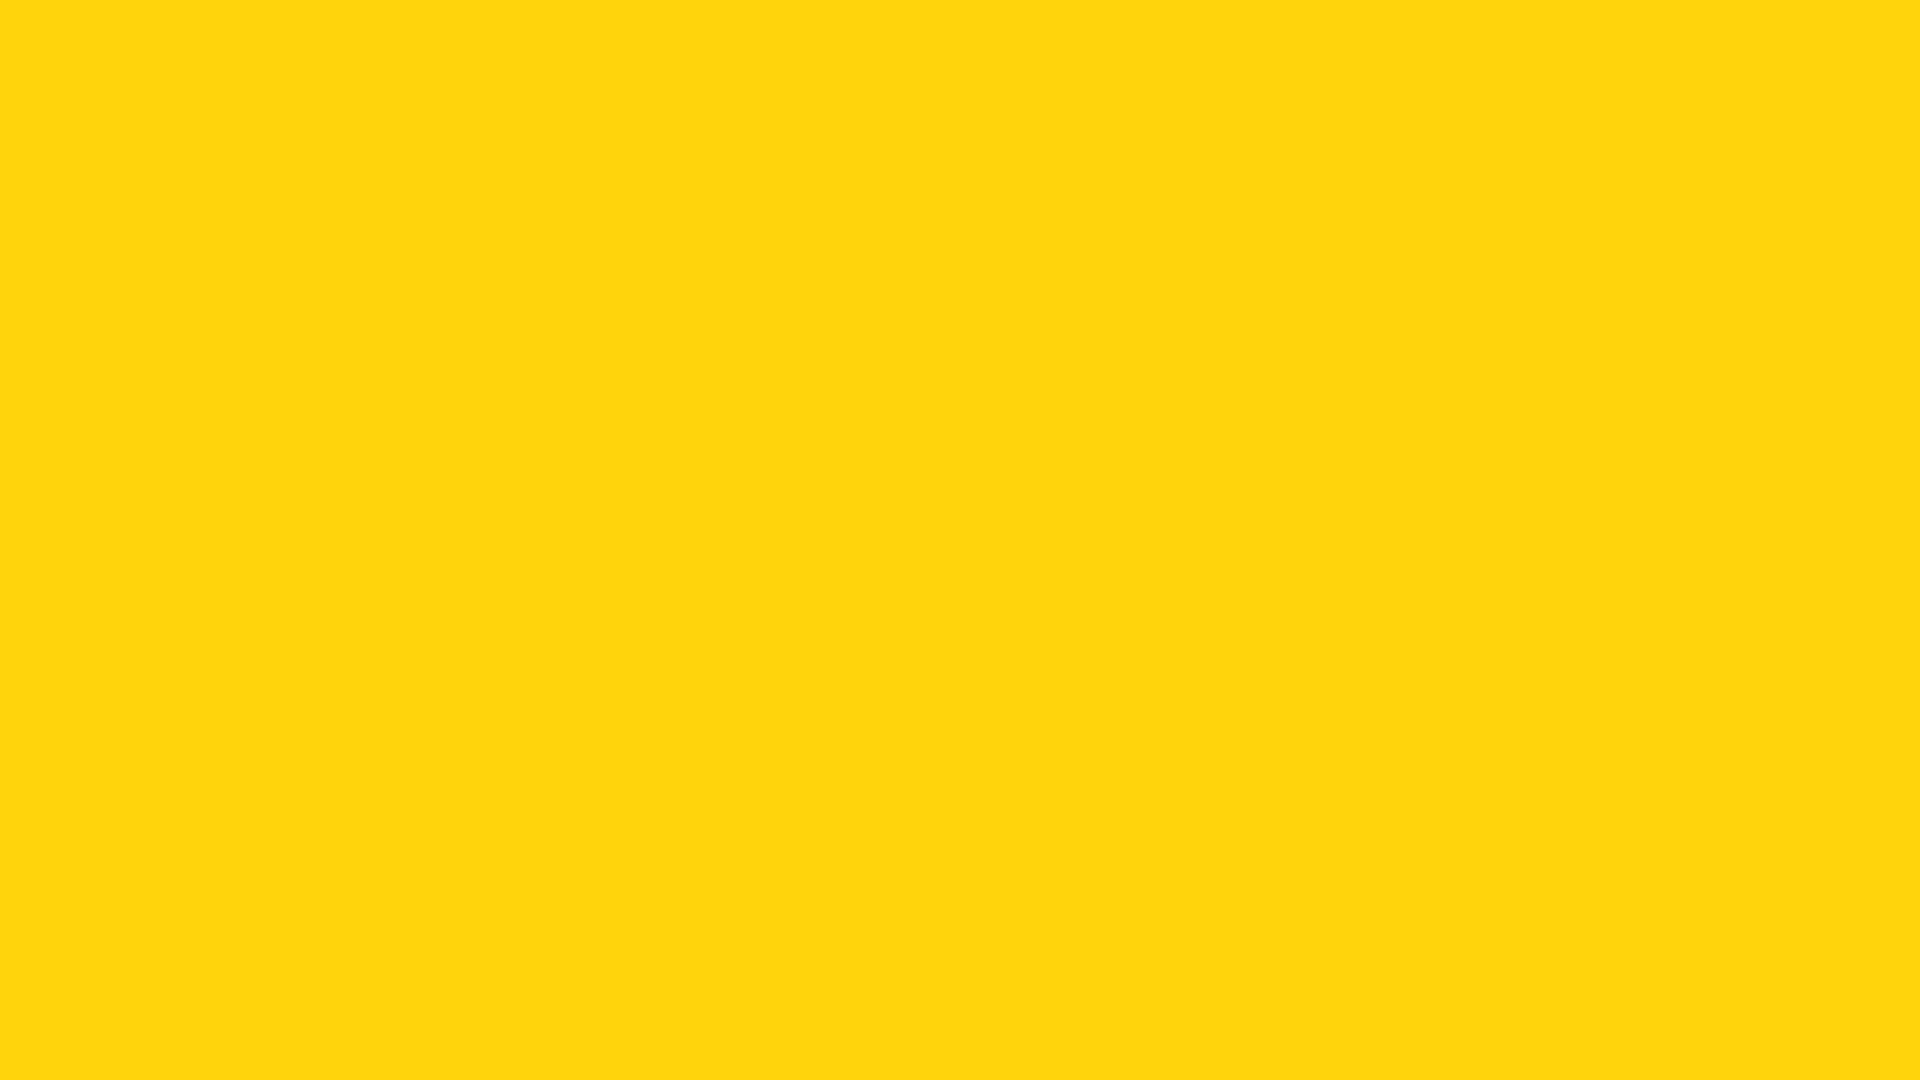 Plain Yellow Wallpaper For Desktop Best Wallpaper Hd Yellow Wallpaper Solid Color Backgrounds Golden Artist Colors